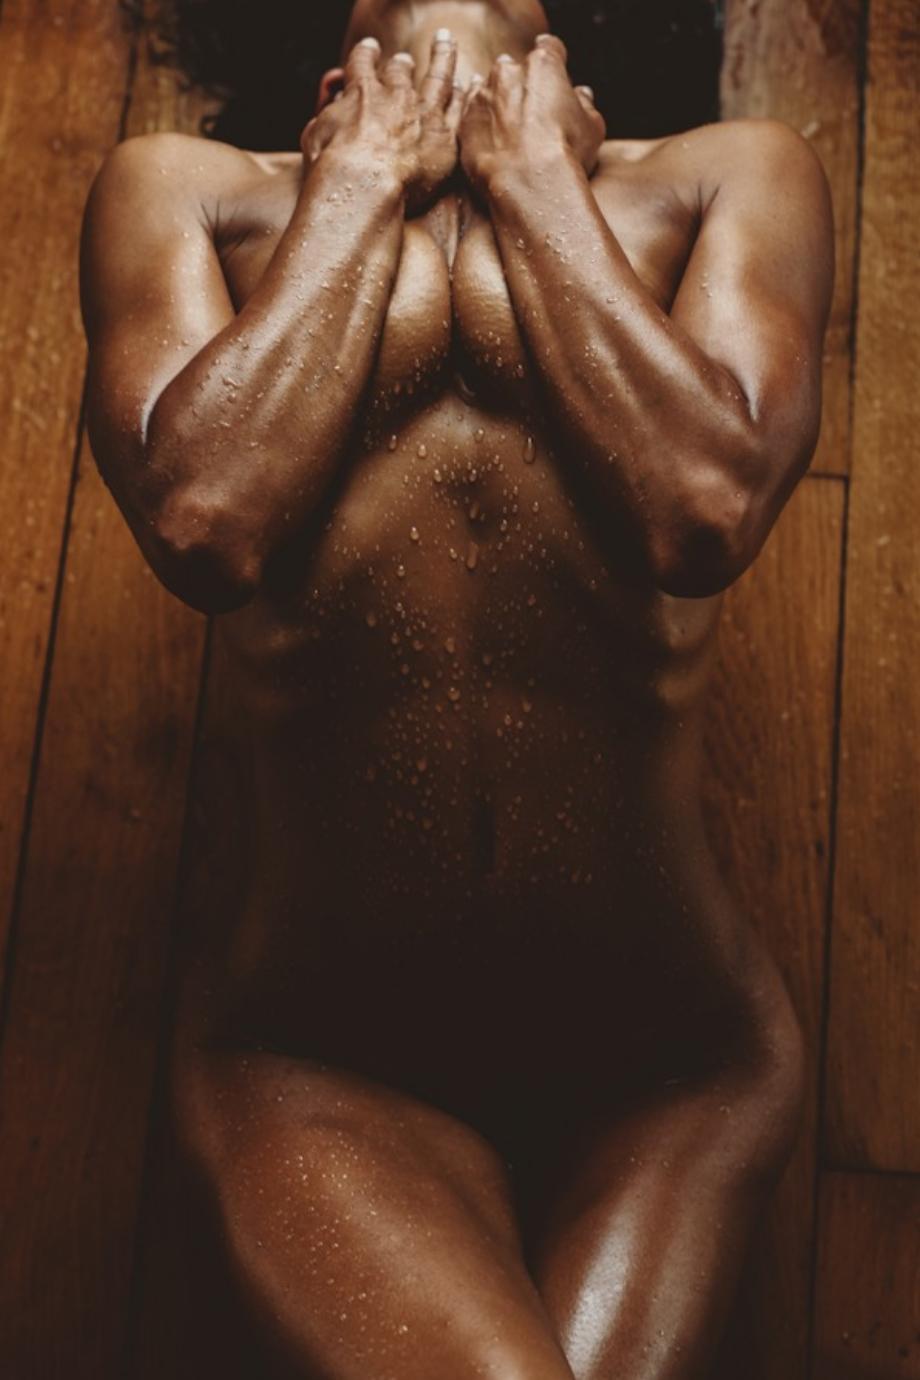 Photo by Tikoy Reborn